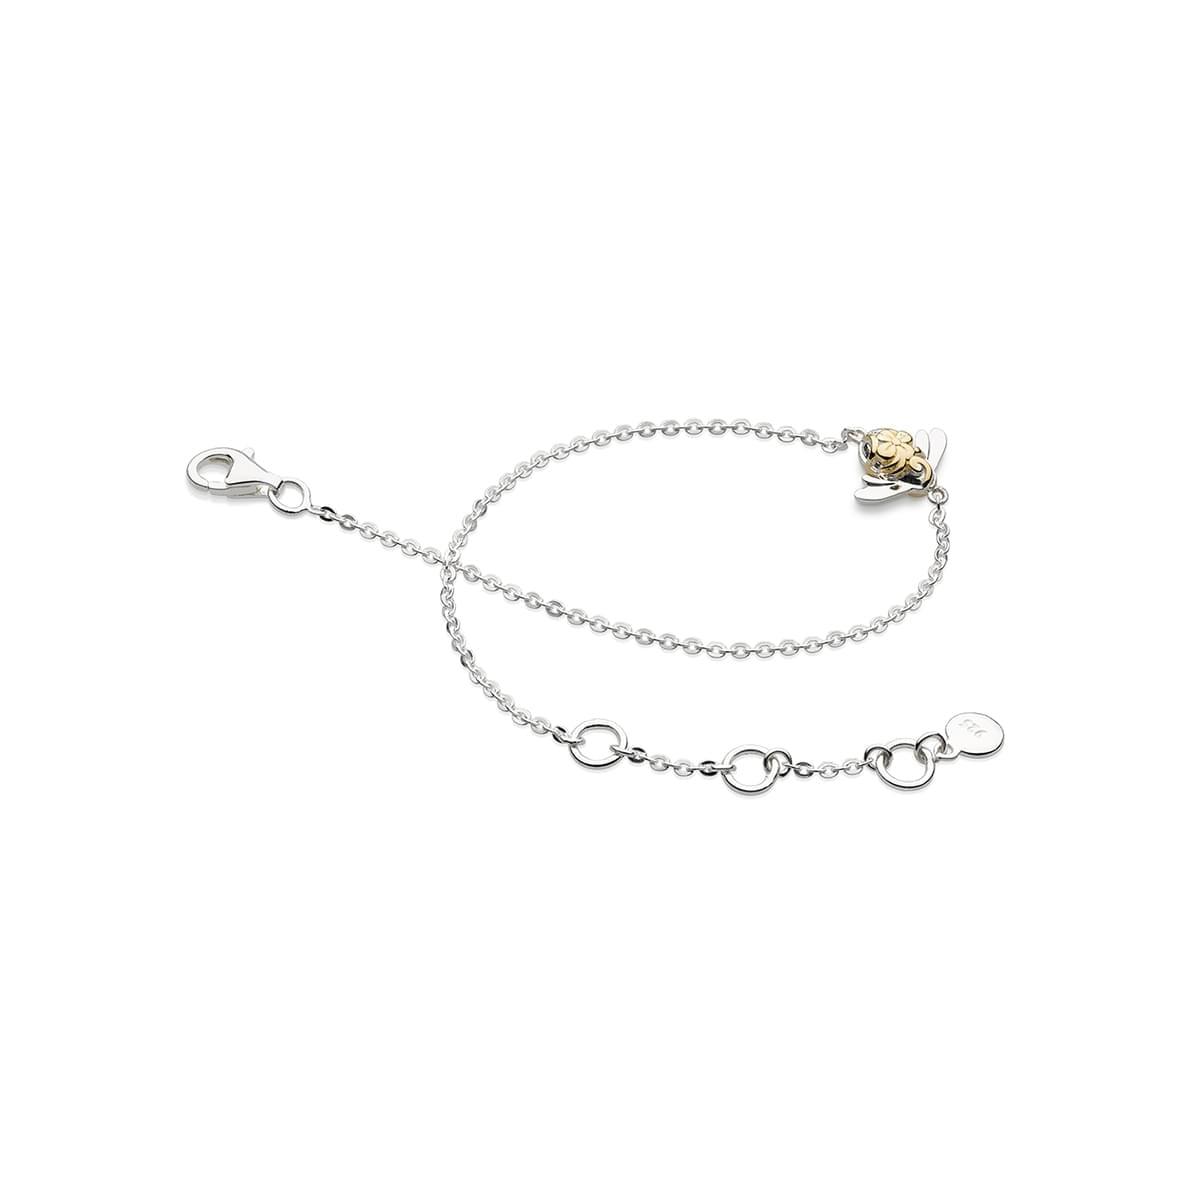 Kit Heath Blossom Bumblebee Single Gold Plate Bracelet